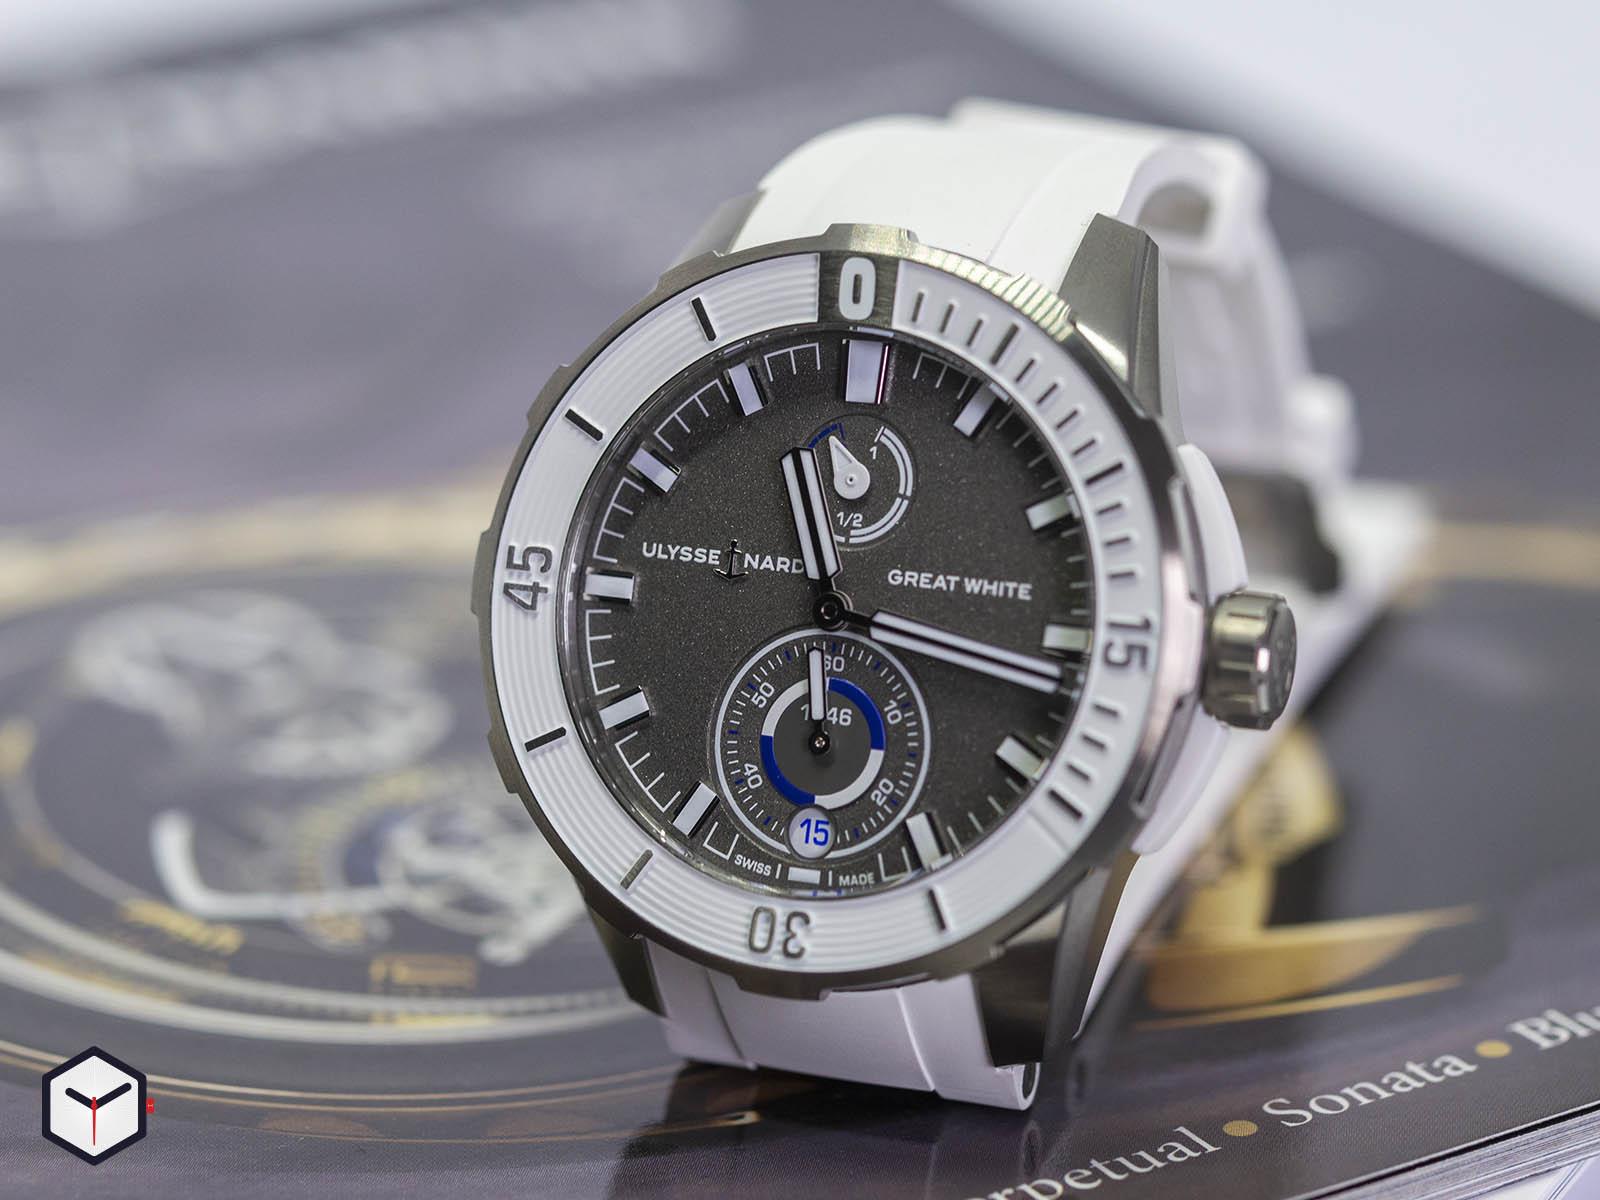 1183-170le-3-90-gw-ulysse-nardin-diver-chronometer-2.jpg